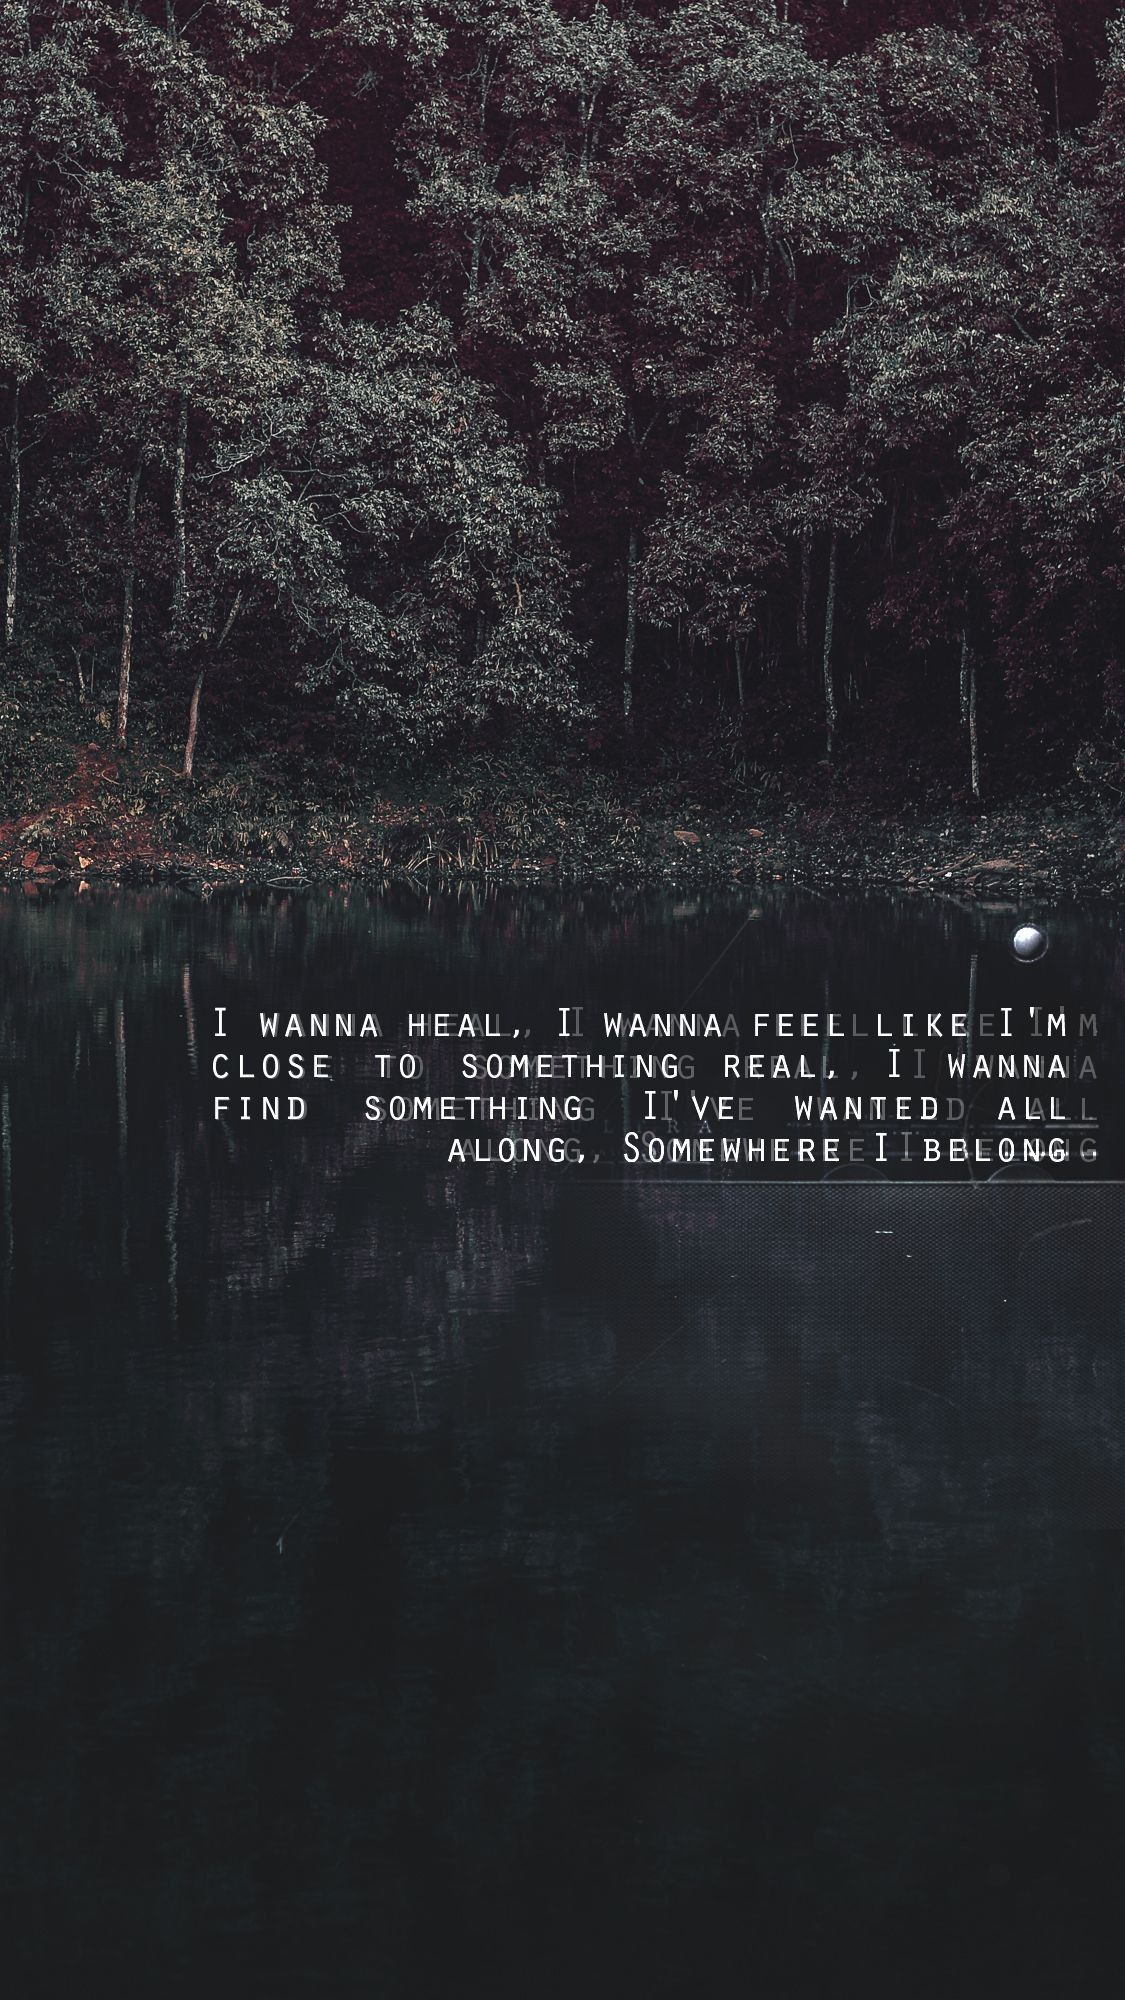 Somewhere I Belong Linkin Park Lyrics Park Quotes